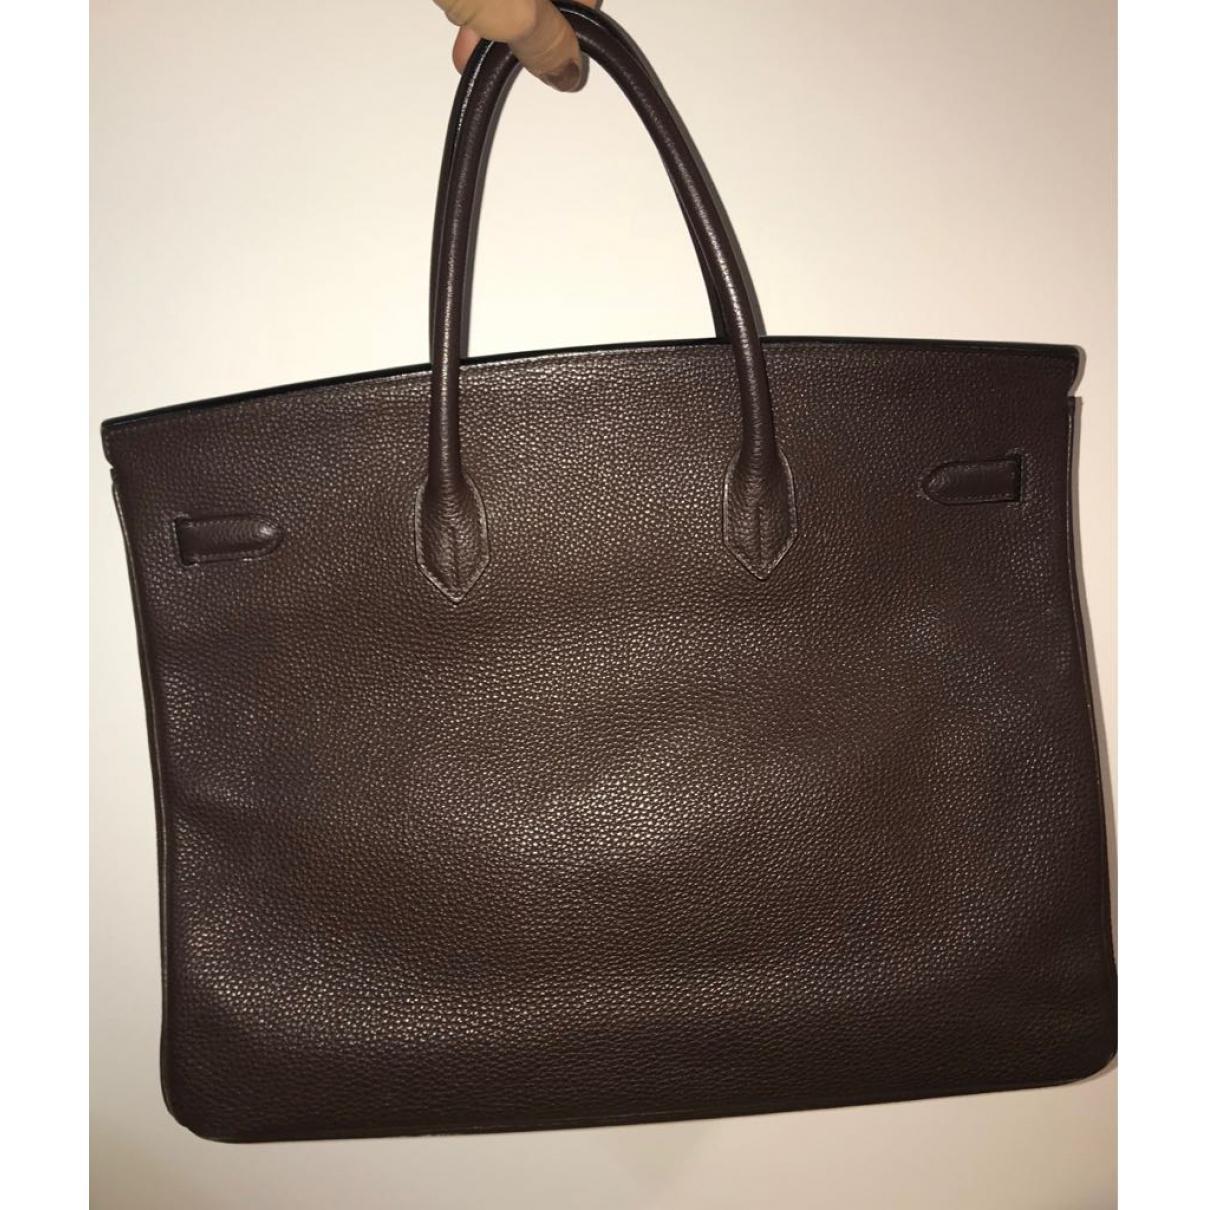 500ffa5f7e Gallery. Previously sold at  Vestiaire Collective · Women s Hermes Birkin  Bag ...